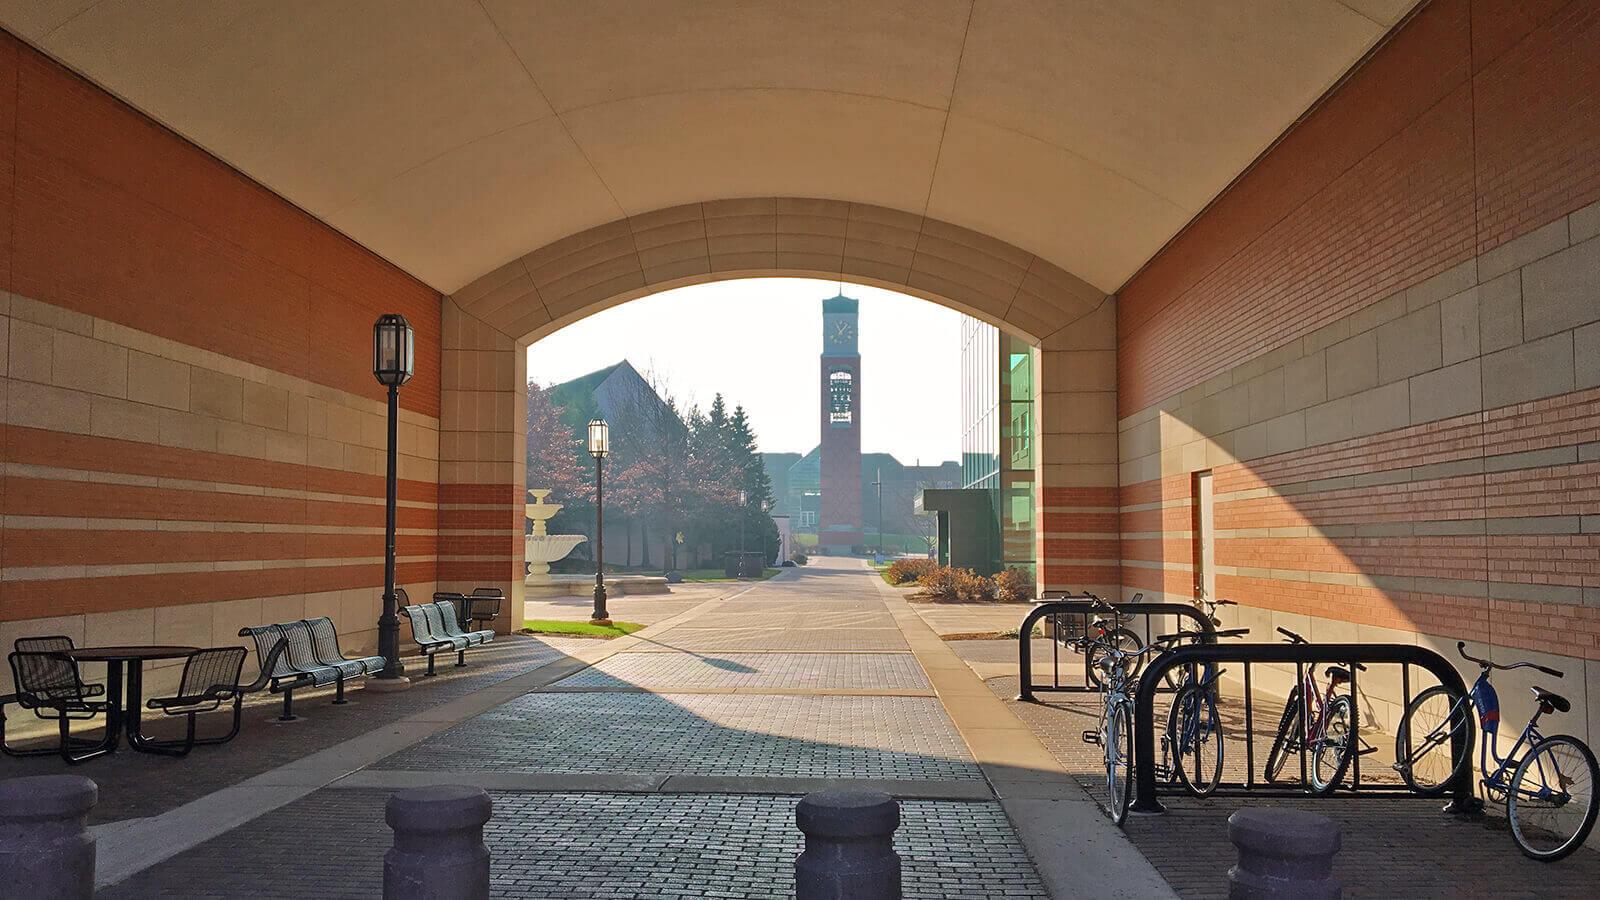 Gvsu Grand Rapids Campus Map.Grand Valley State University Cappex